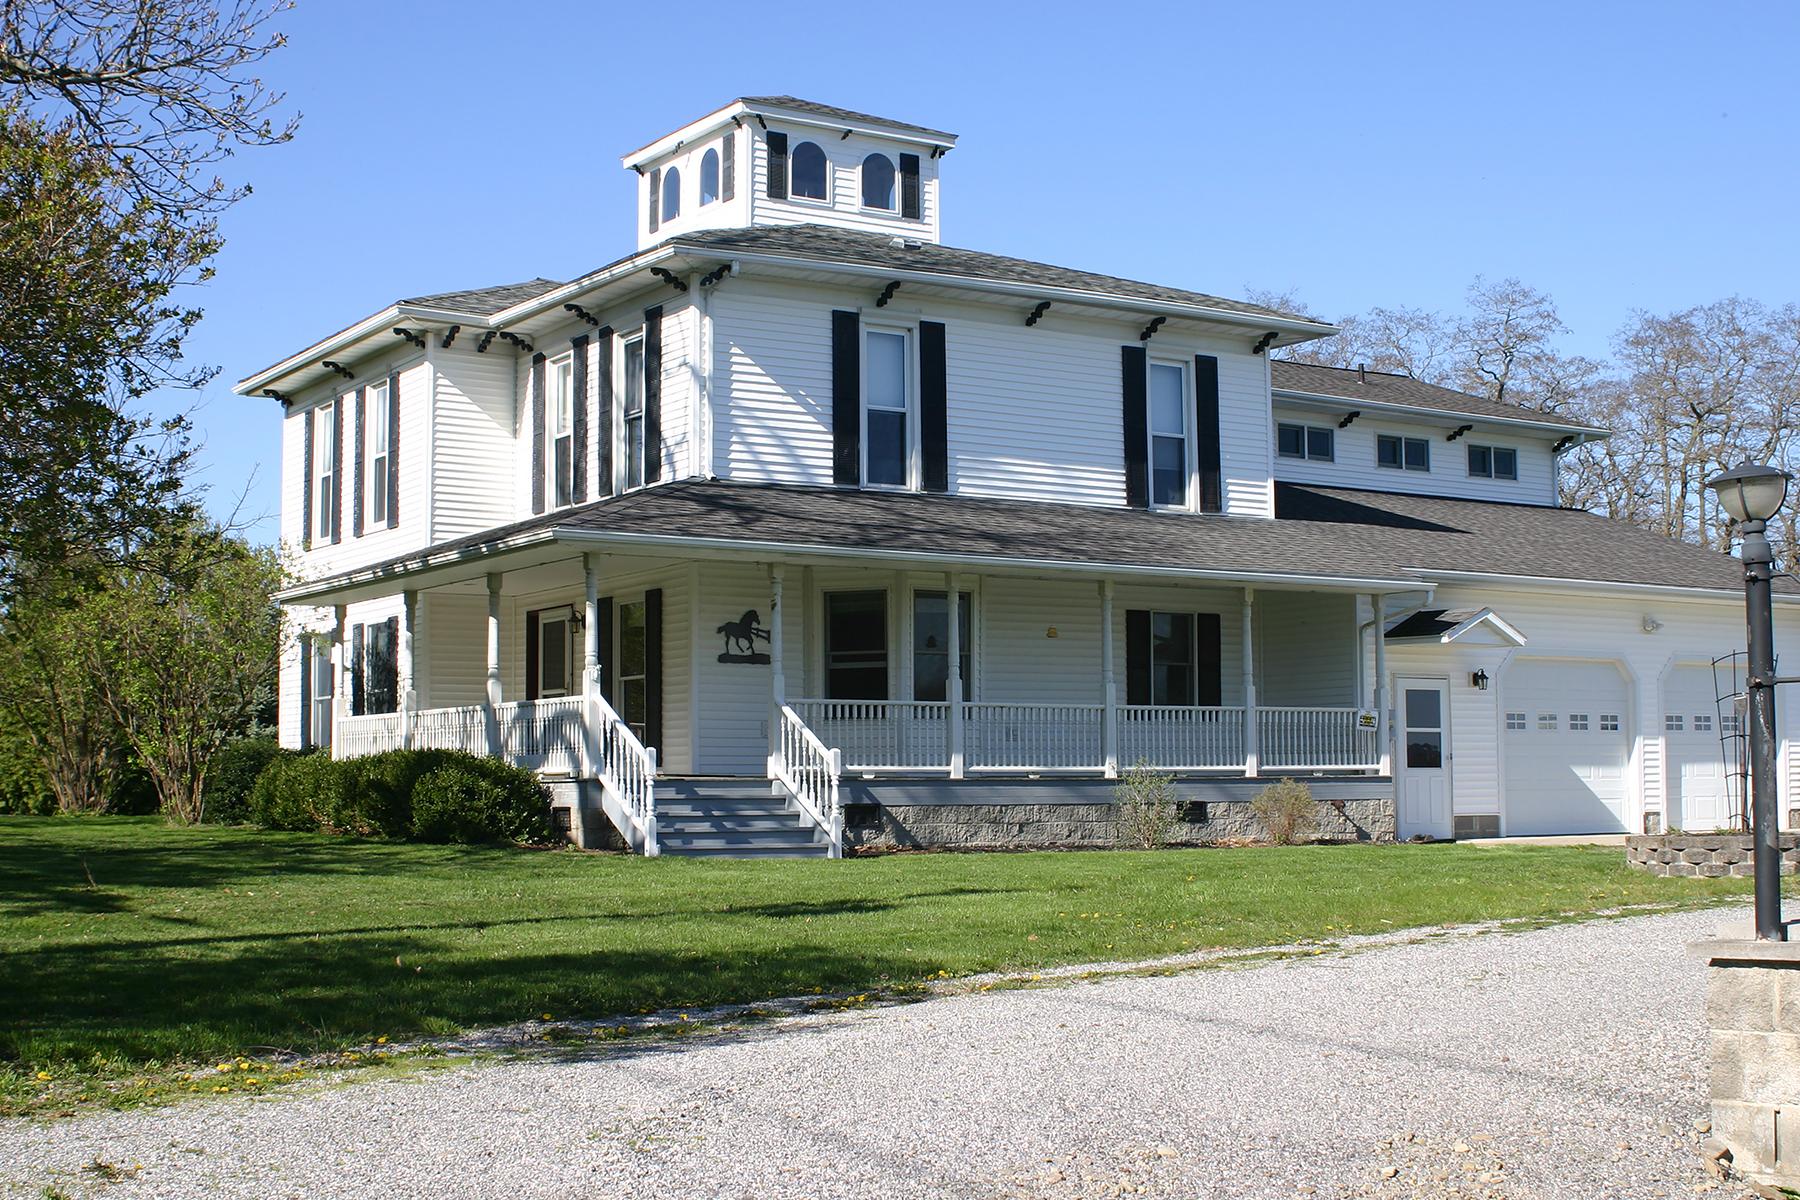 独户住宅 为 销售 在 Dream Valley View Ranch and Resort 8983 & 899 Oakland Rd Nunda, 纽约州 14517 美国